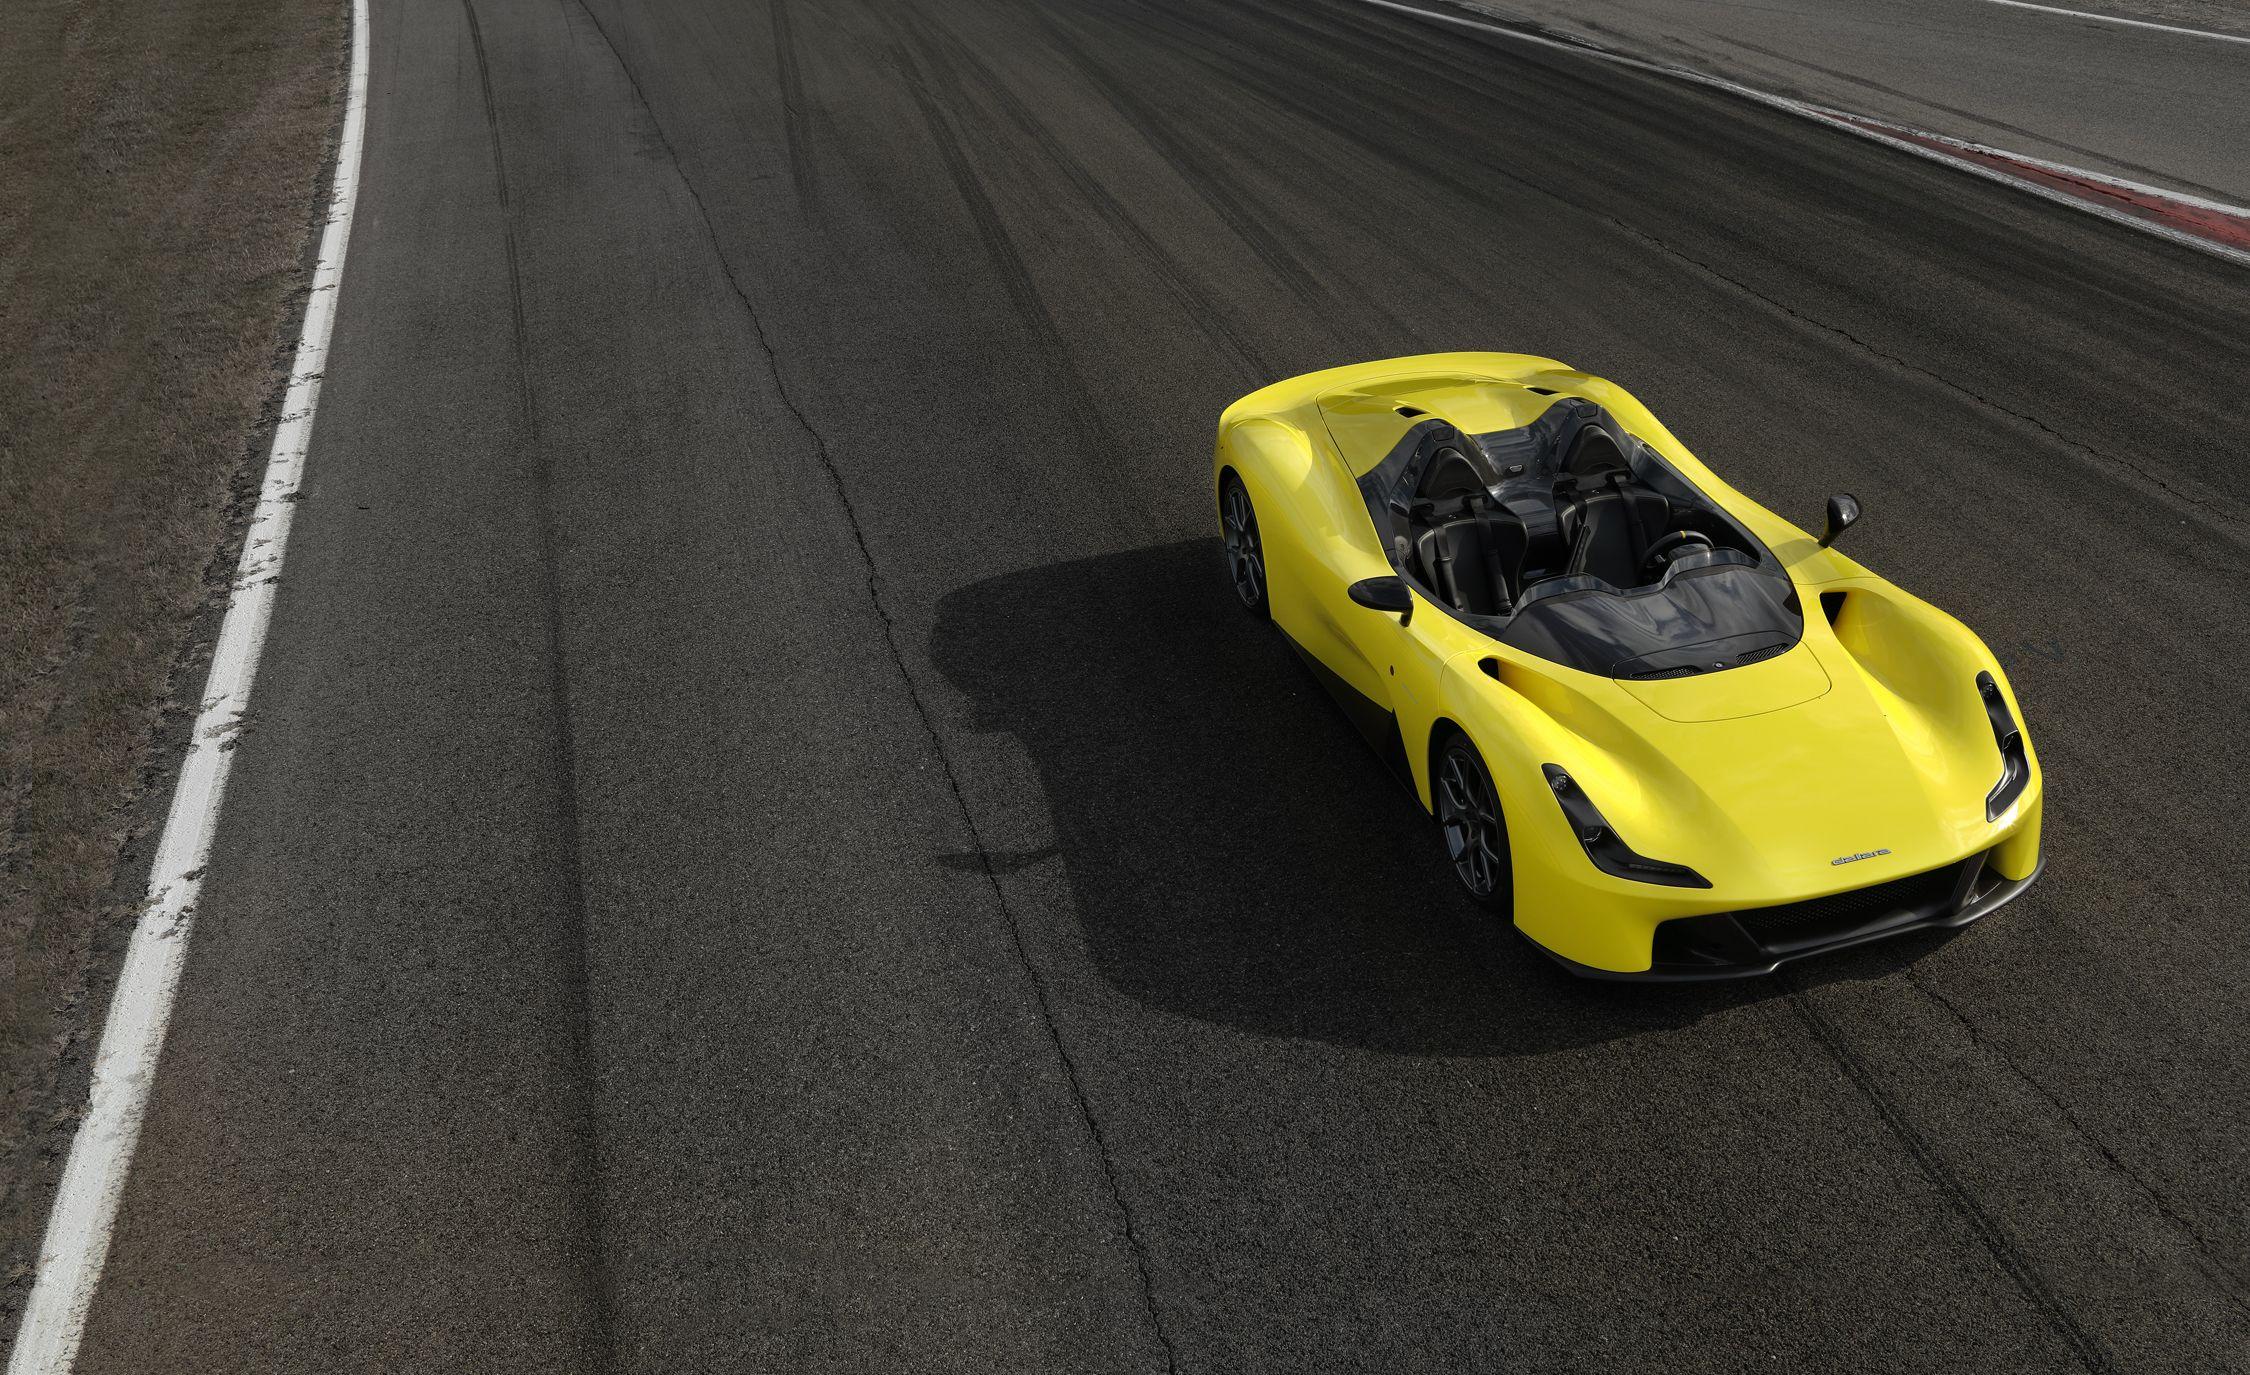 Dallara Stradale: A Road Car from a Huge Name in Motorsport